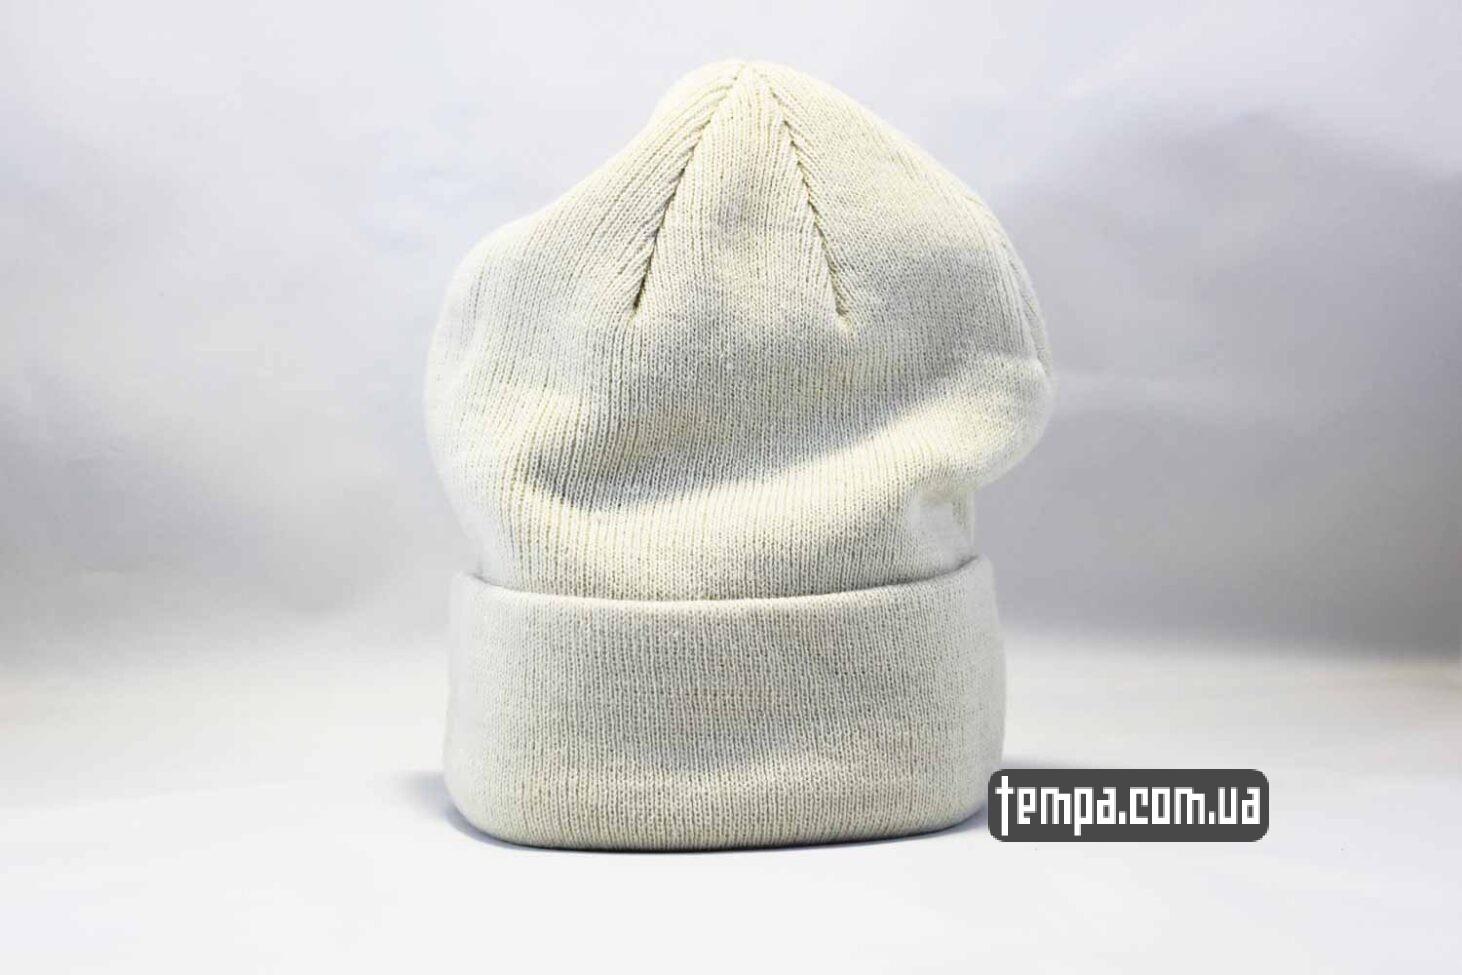 шапка beanie чисто белая однотонная без логотипов ASOS HM